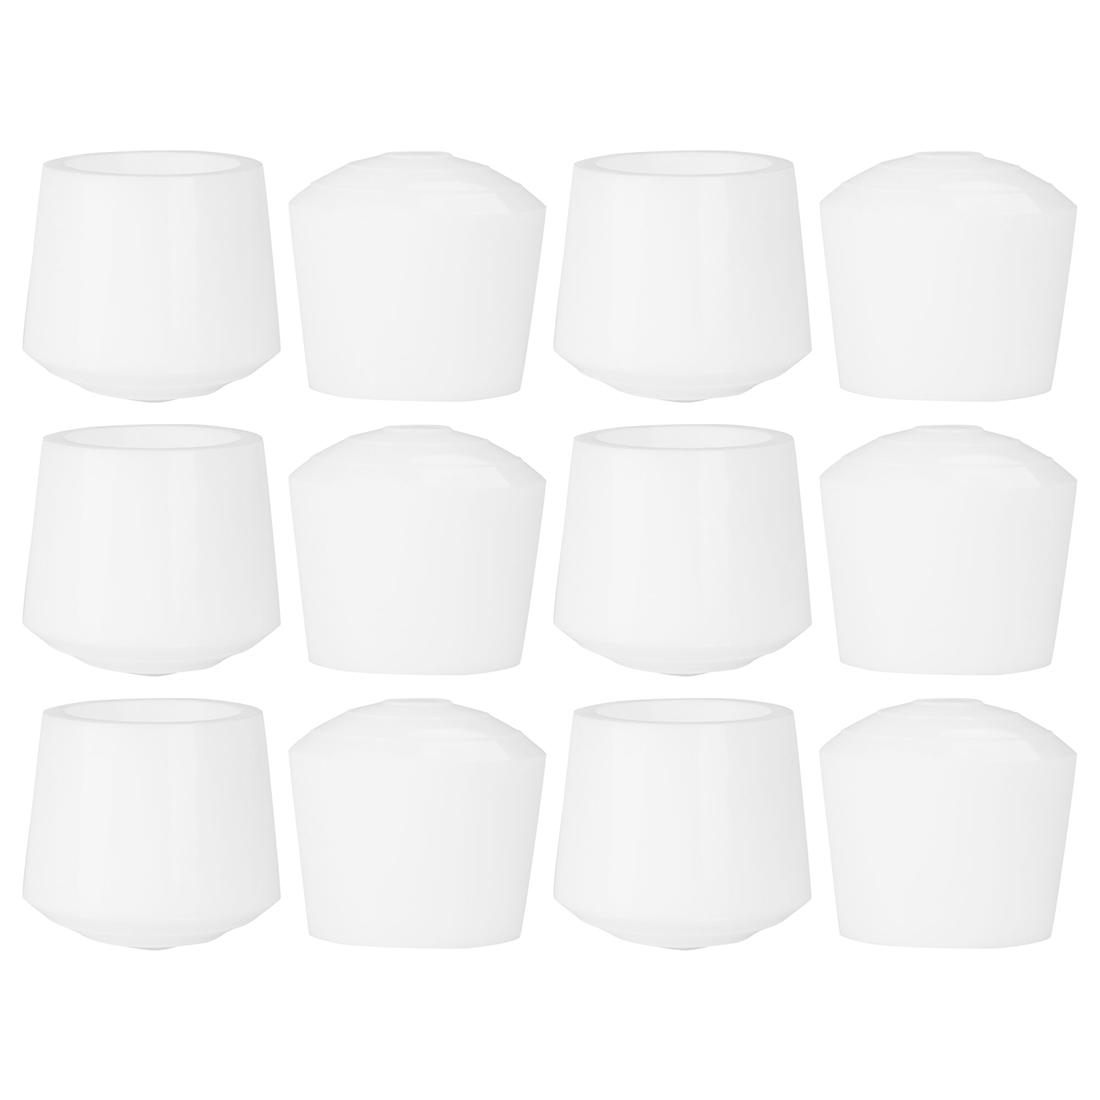 "Rubber Leg Cap Tip Cup Feet Cover 35mm 1 3/8"" Inner Dia 12pcs for Furniture Desk"